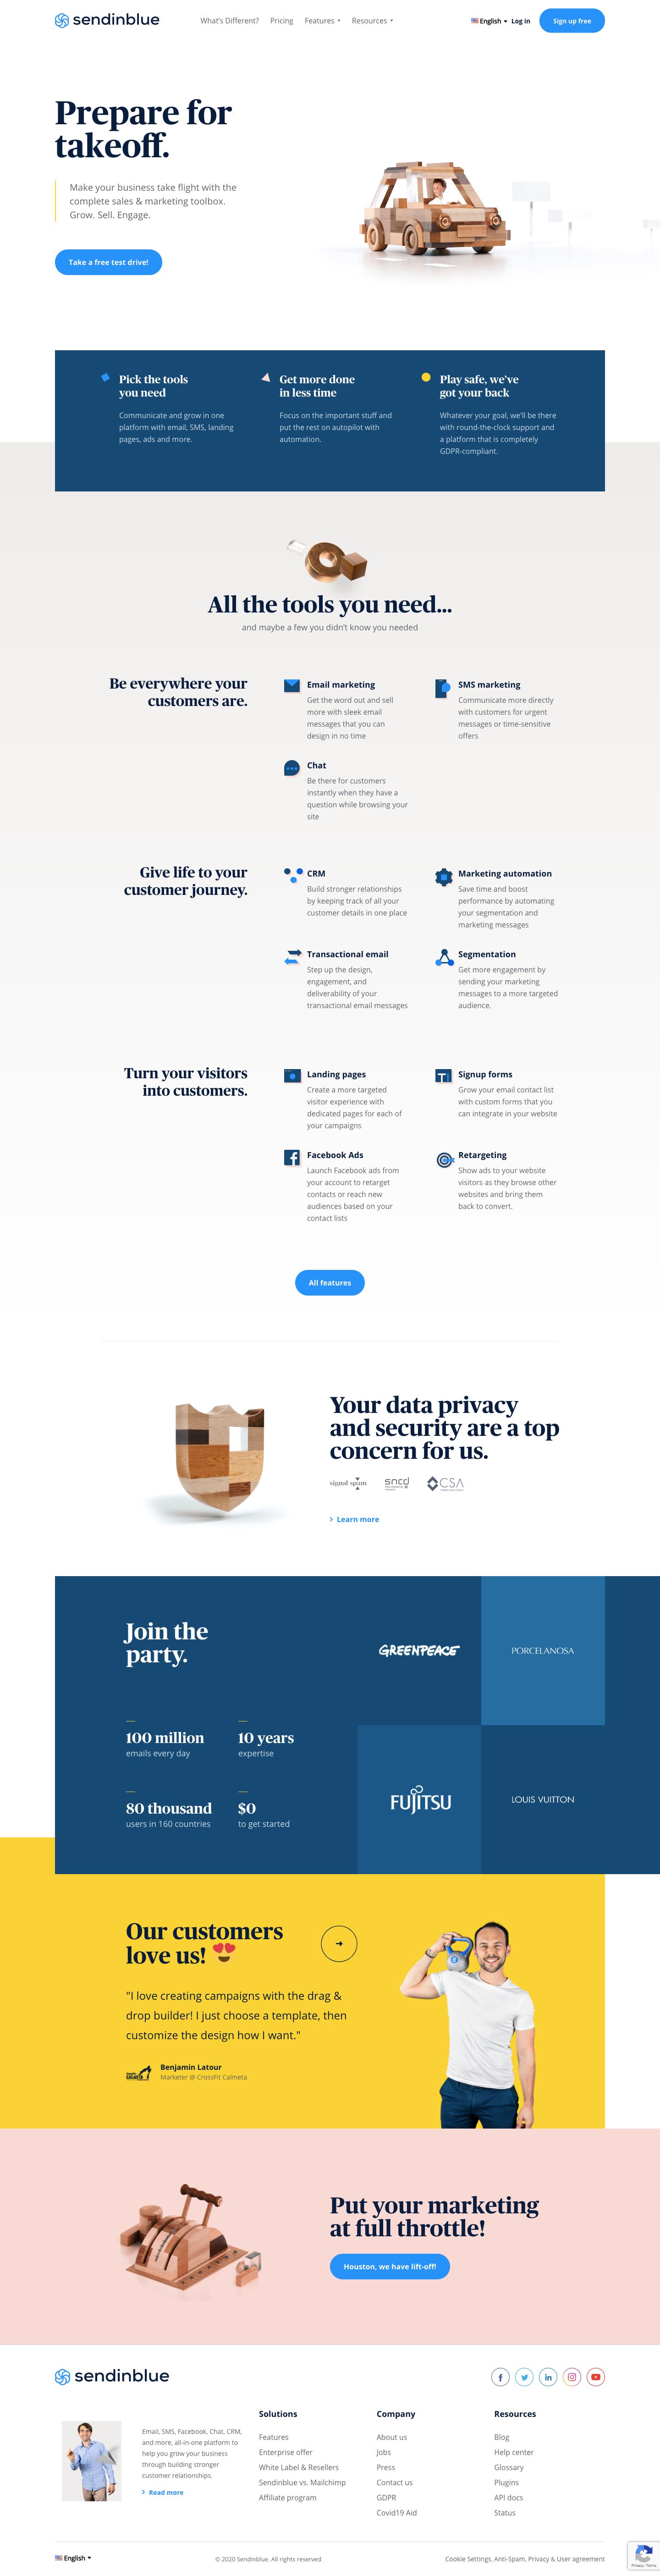 Sendinblue Landing Page